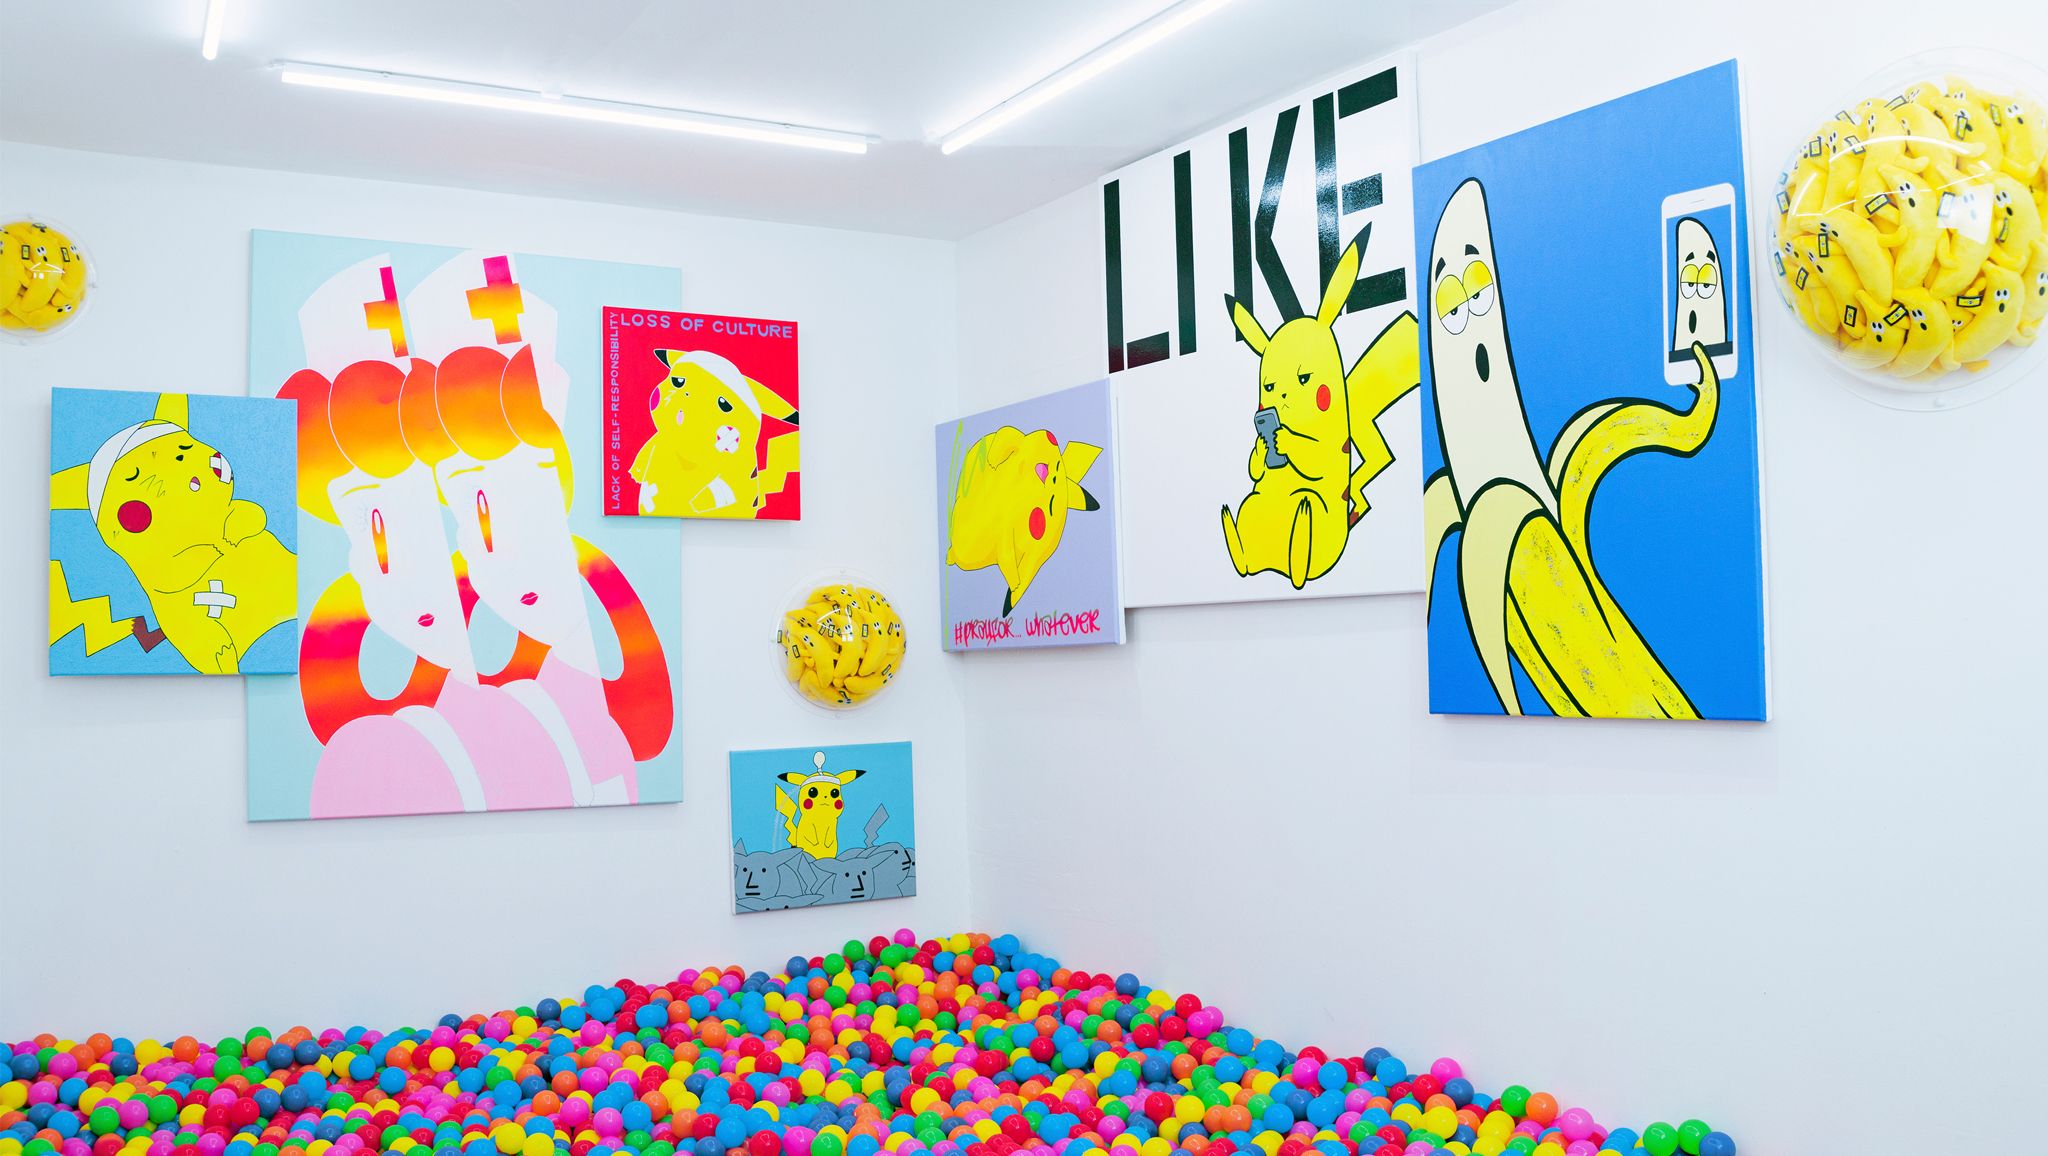 Michael Pybus: Soft Play